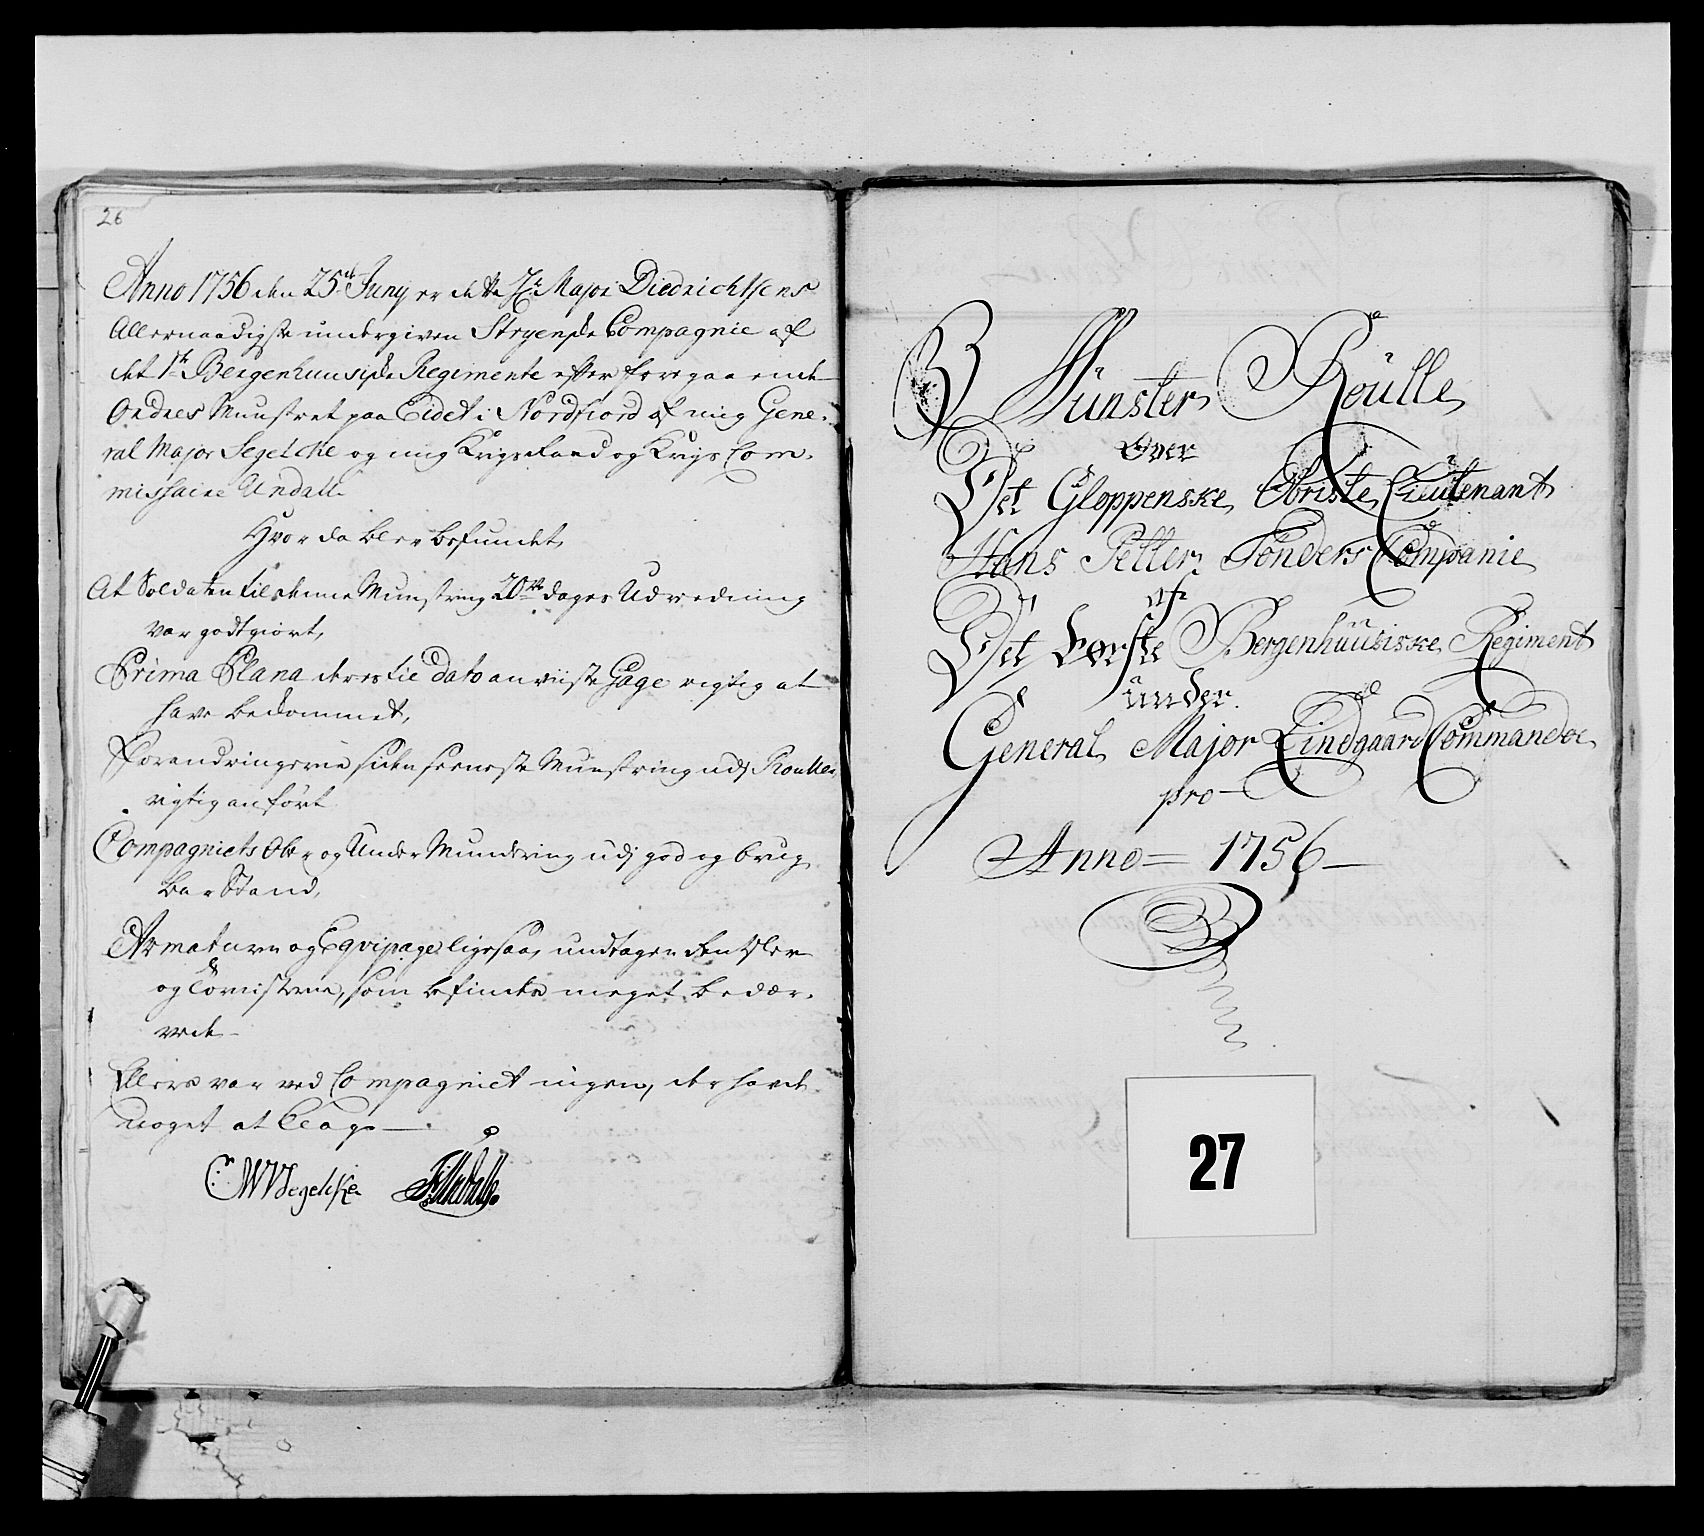 RA, Kommanderende general (KG I) med Det norske krigsdirektorium, E/Ea/L0517: 1. Bergenhusiske regiment, 1742-1756, s. 399